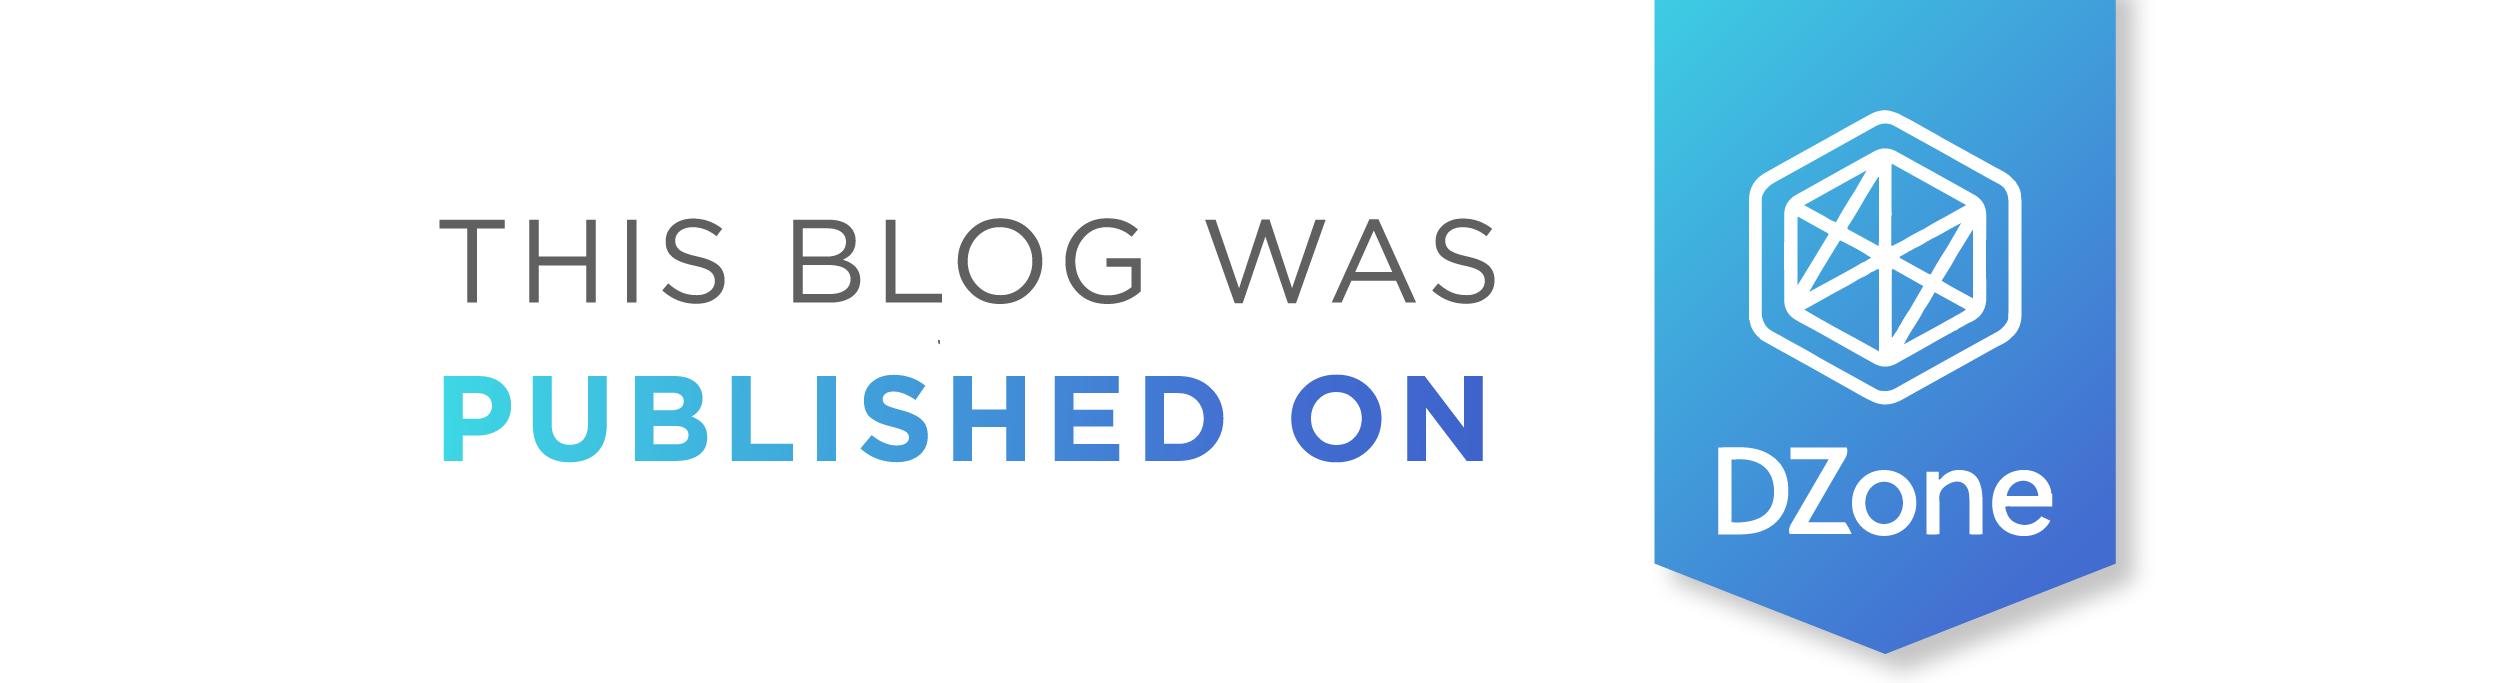 DZone blog